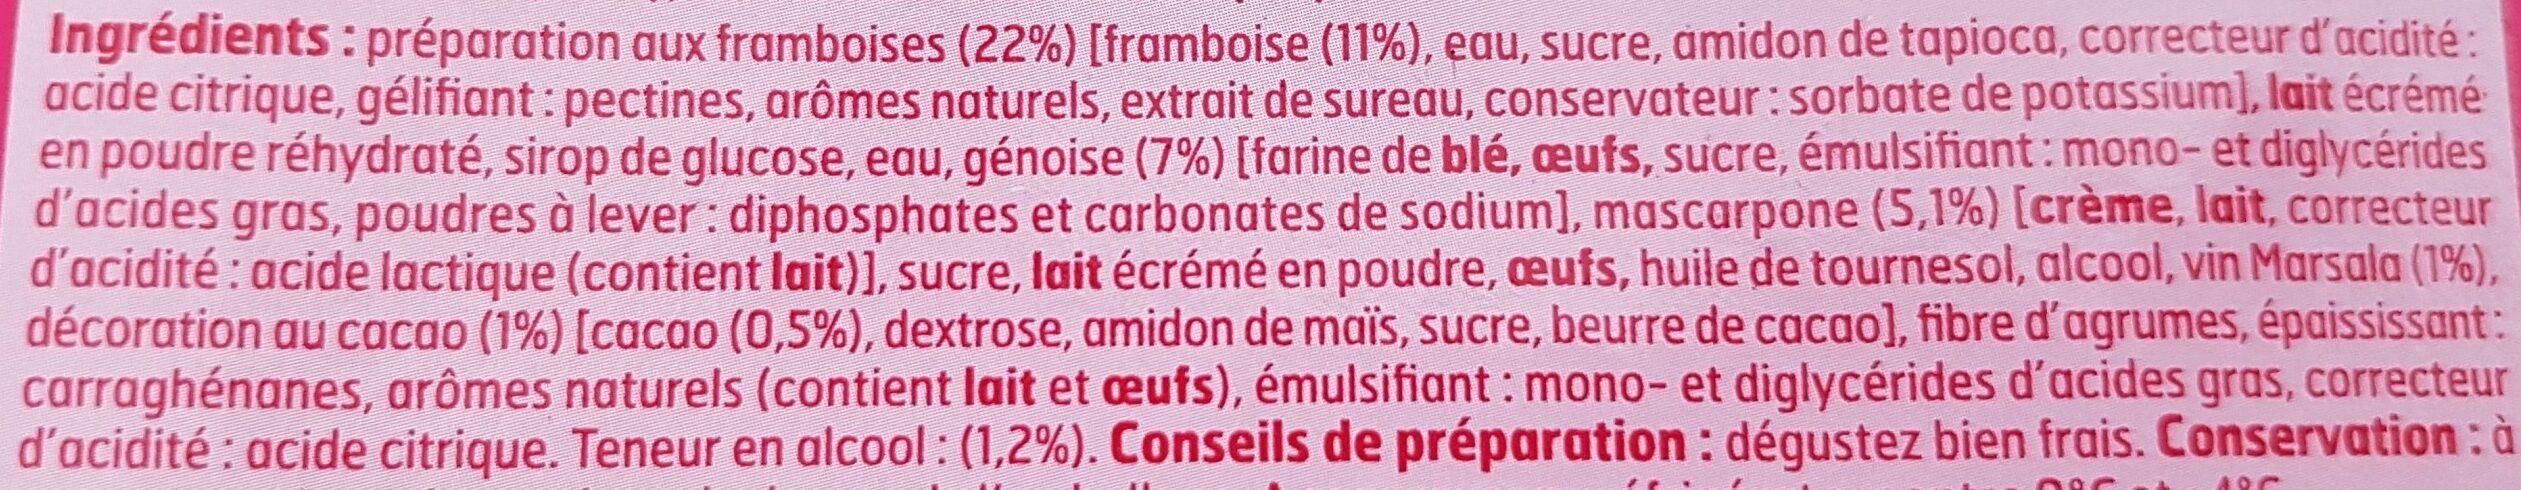 Tiramisù framboise - Ingredients